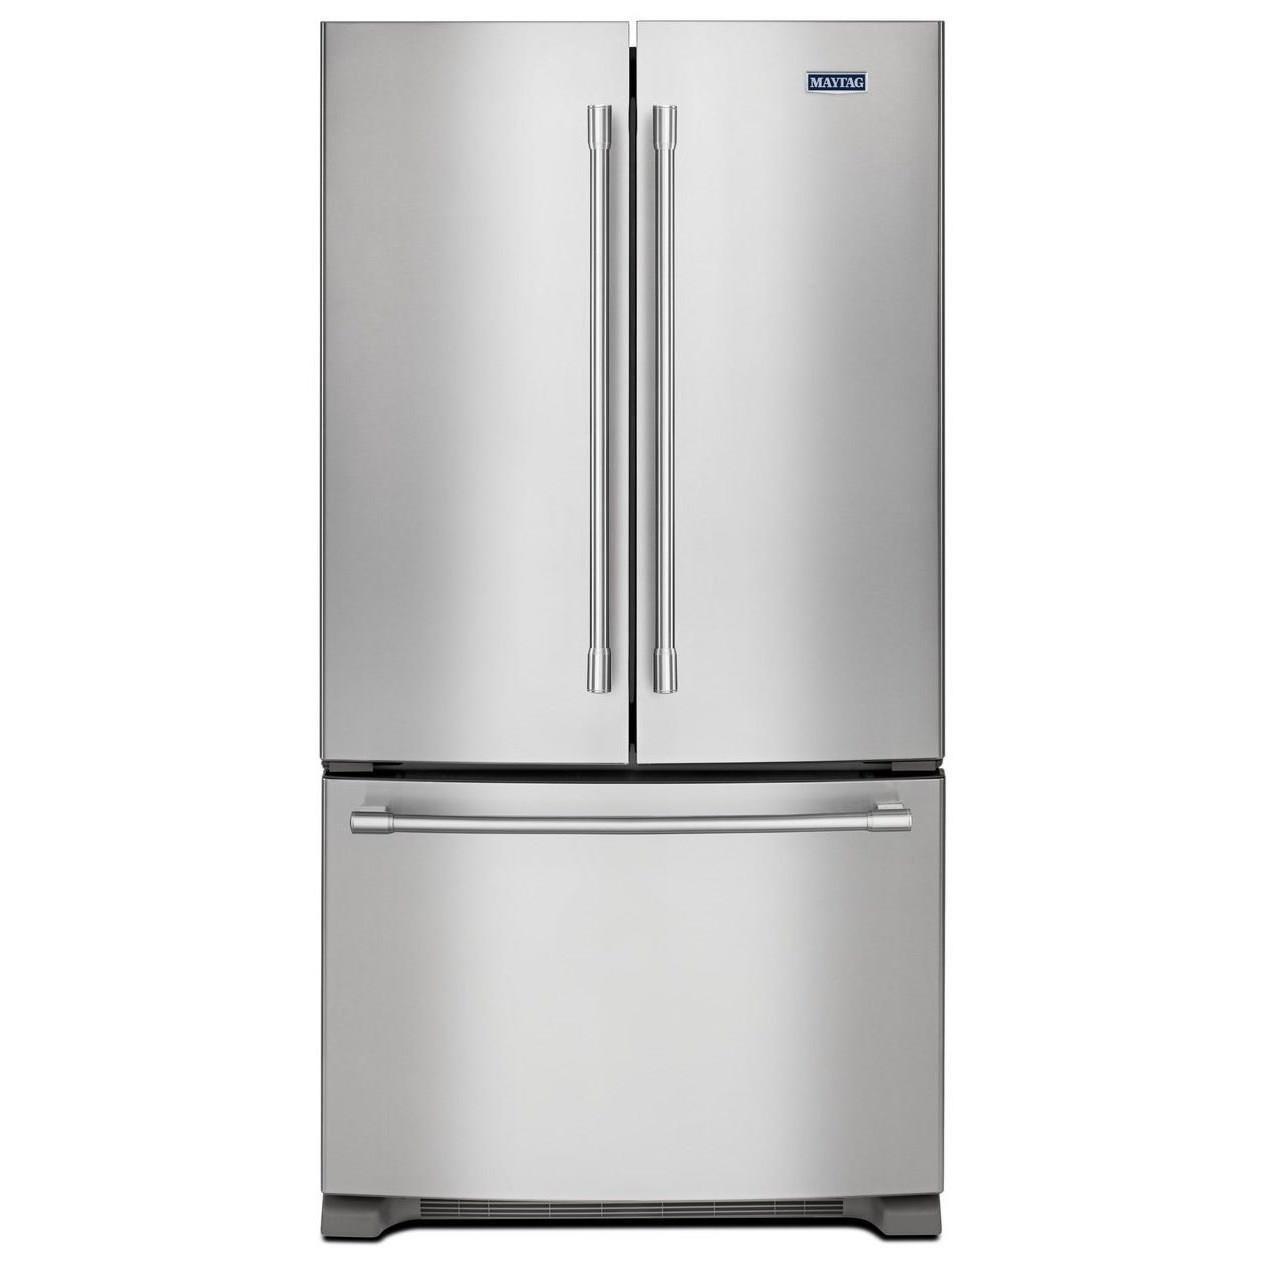 "Maytag French Door Refrigerators 36"" Counter Depth French Door Refrigerator by Maytag at Wilcox Furniture"